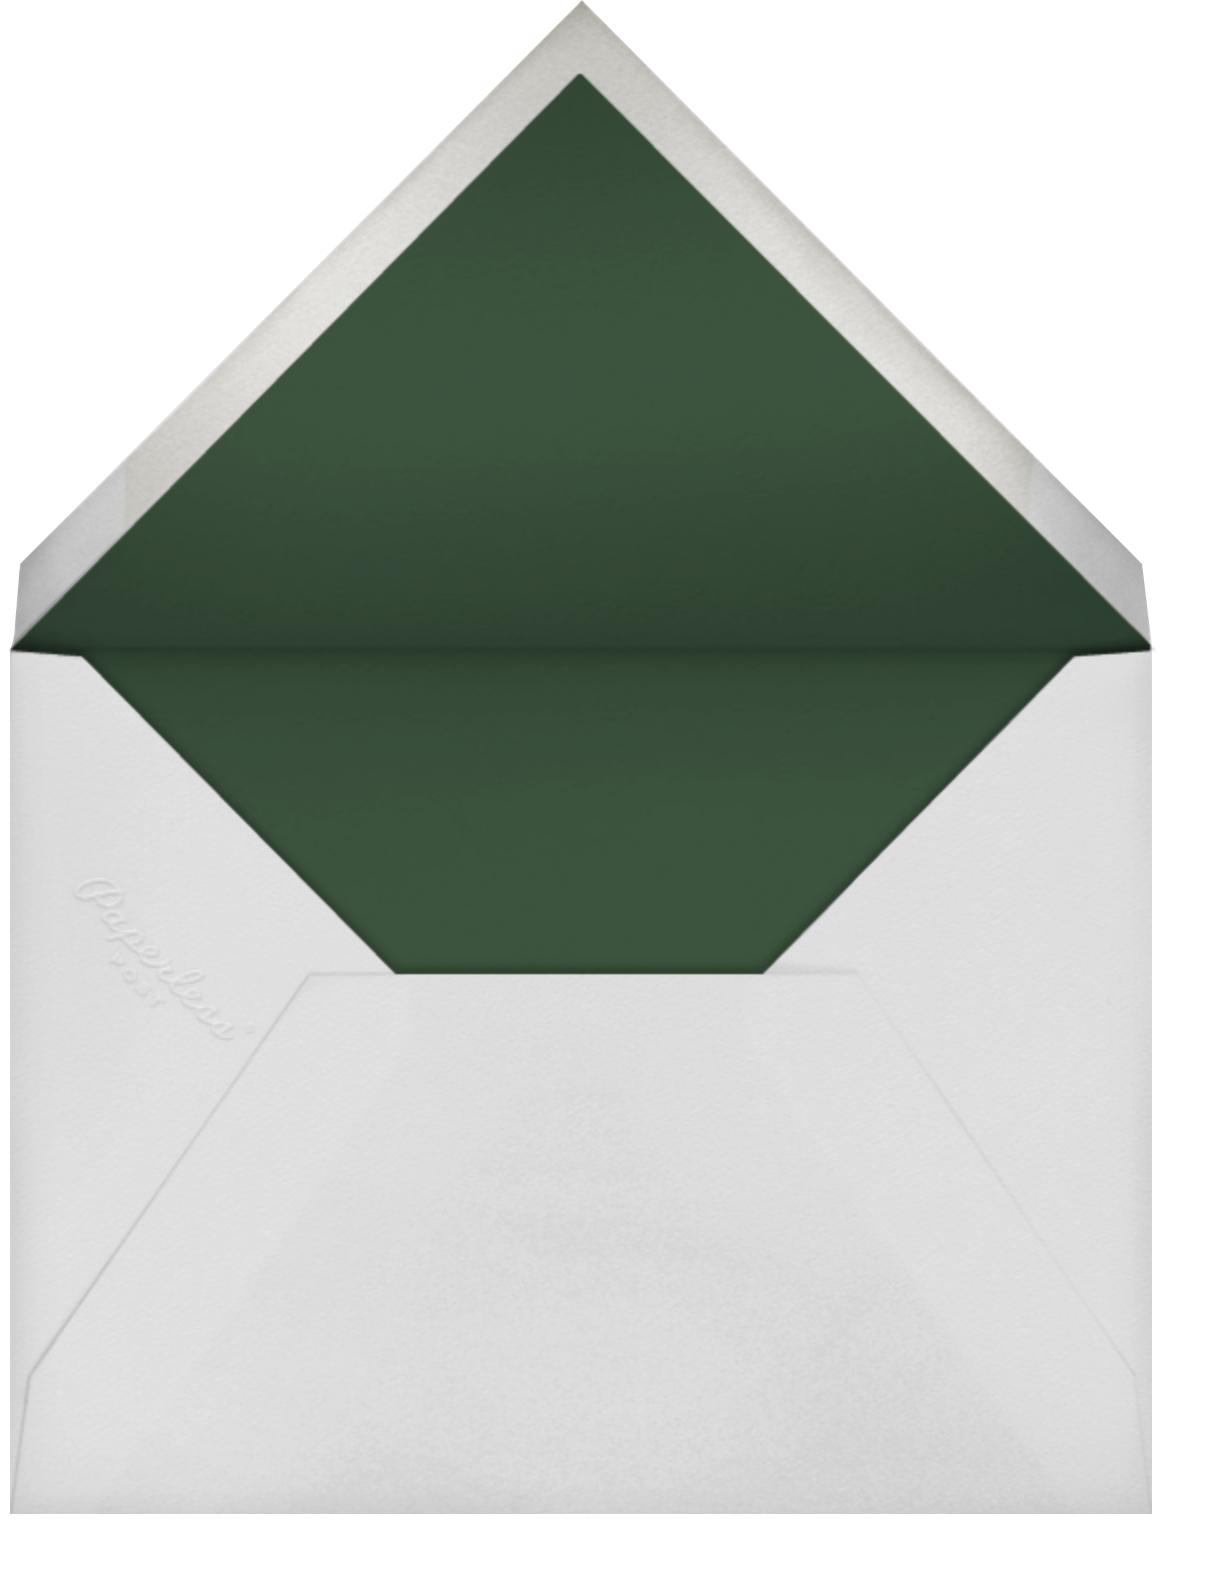 Cactus (Becca Stadtlander) - Red Cap Cards - Envelope